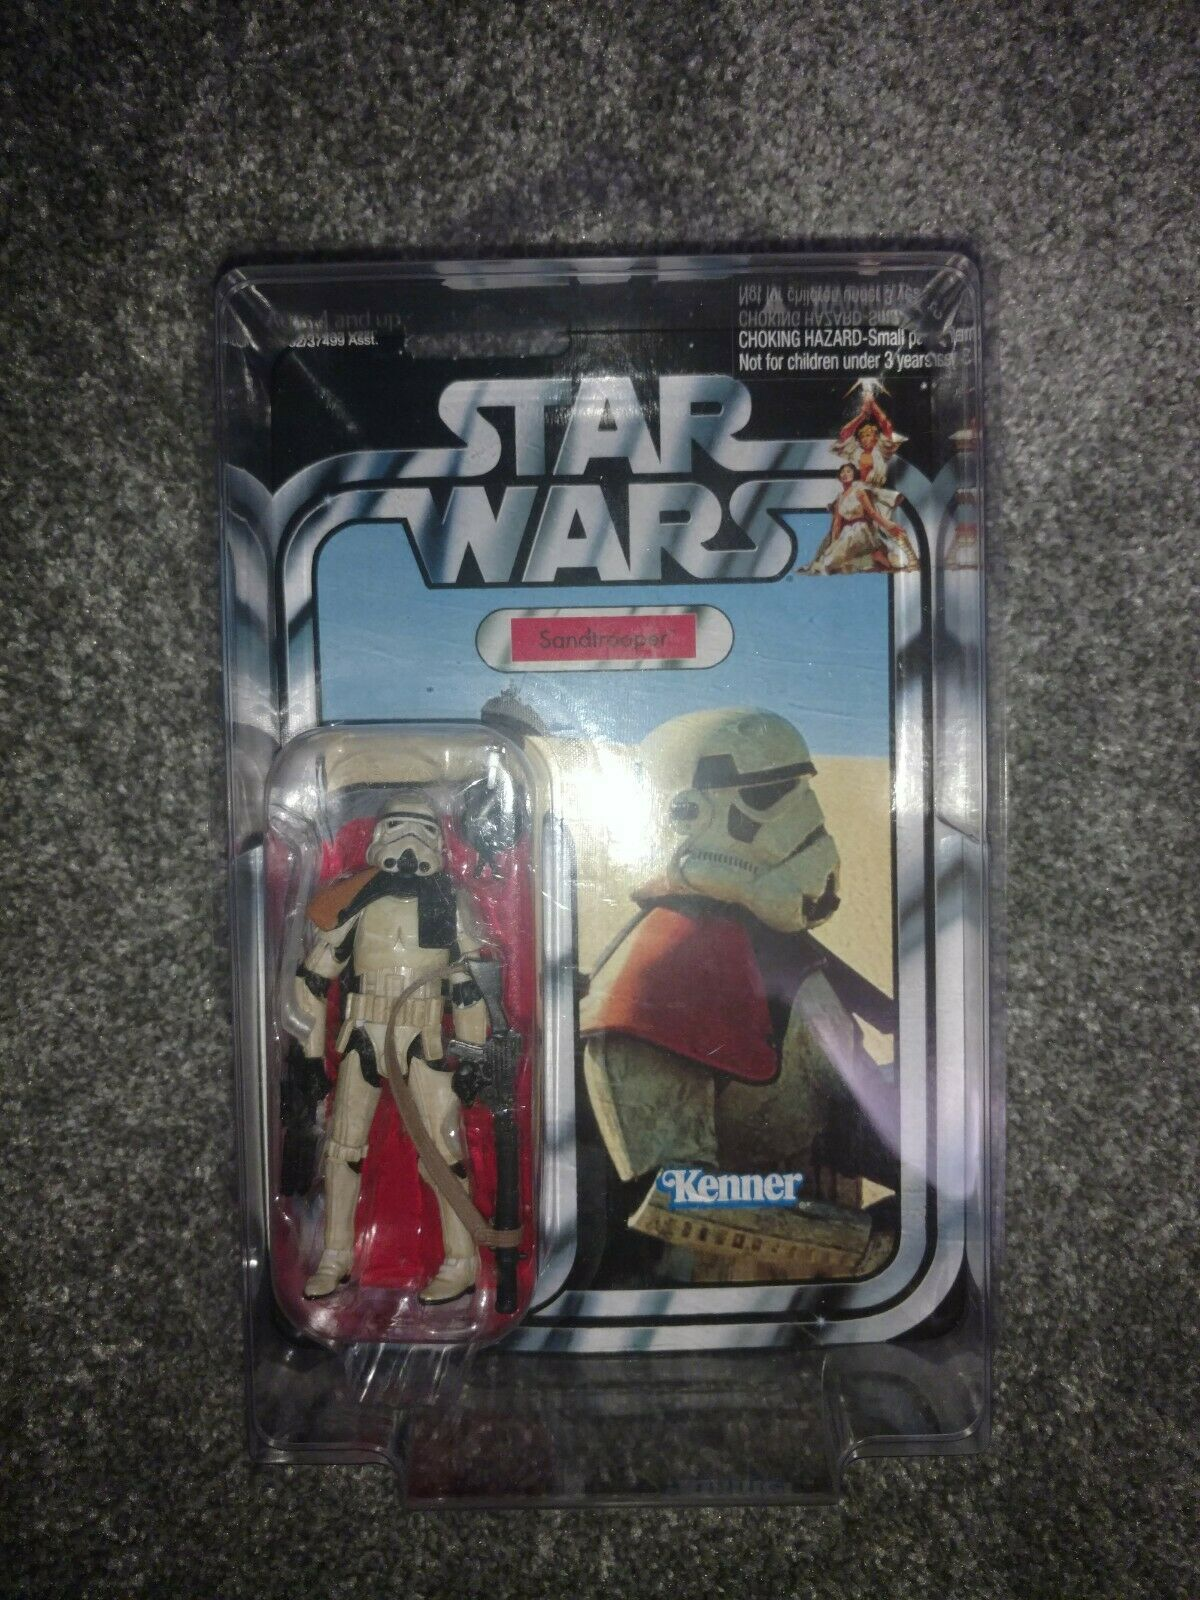 Star Wars The Vintage Collection Sandtrooper with star case